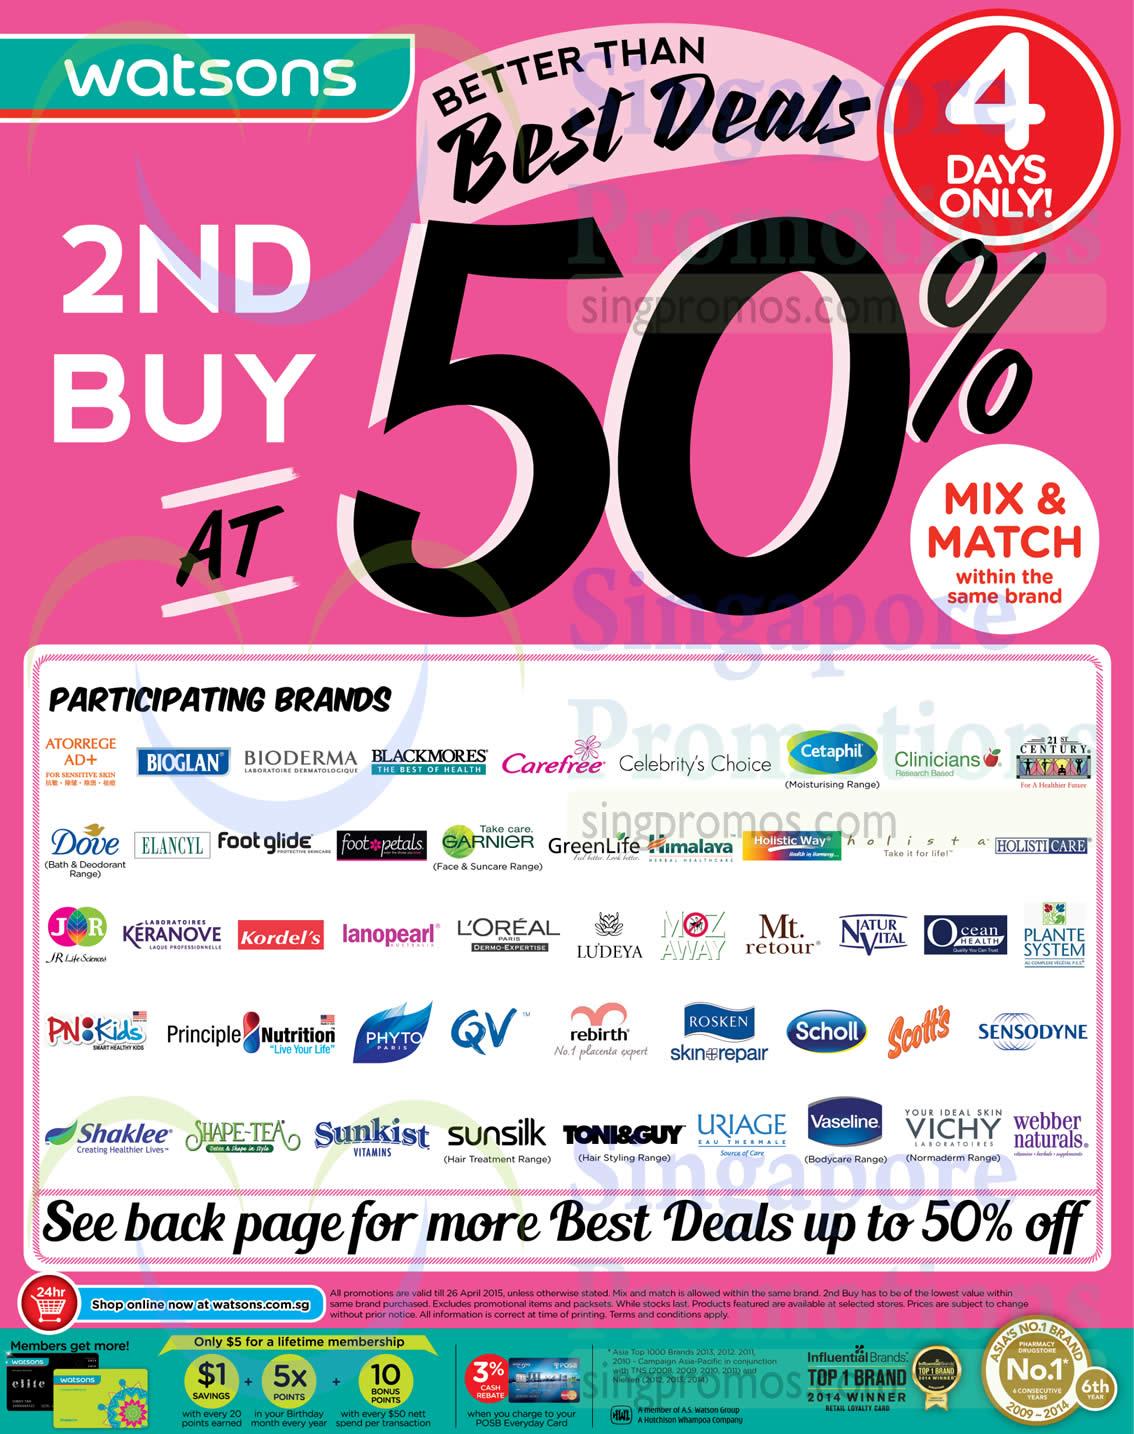 (Till 26 Apr) 2nd Buy at 50 Percent Off, Mix n Match Same Brand, Bioglan, Blackmores , Carefree, Celebrity's Choice, Cetaphil, Dove, Garnier